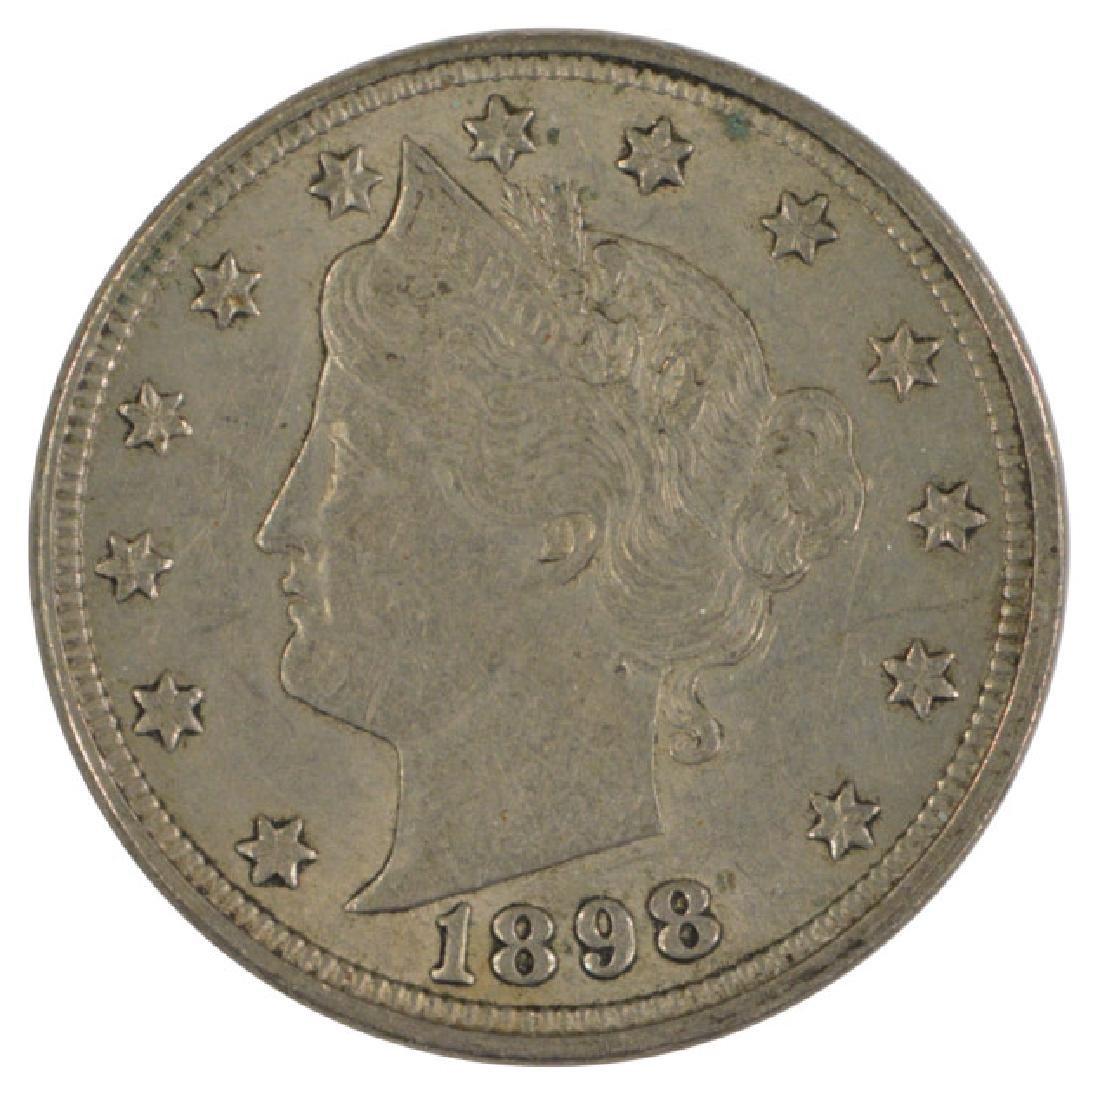 1898 Liberty Nickel Coin